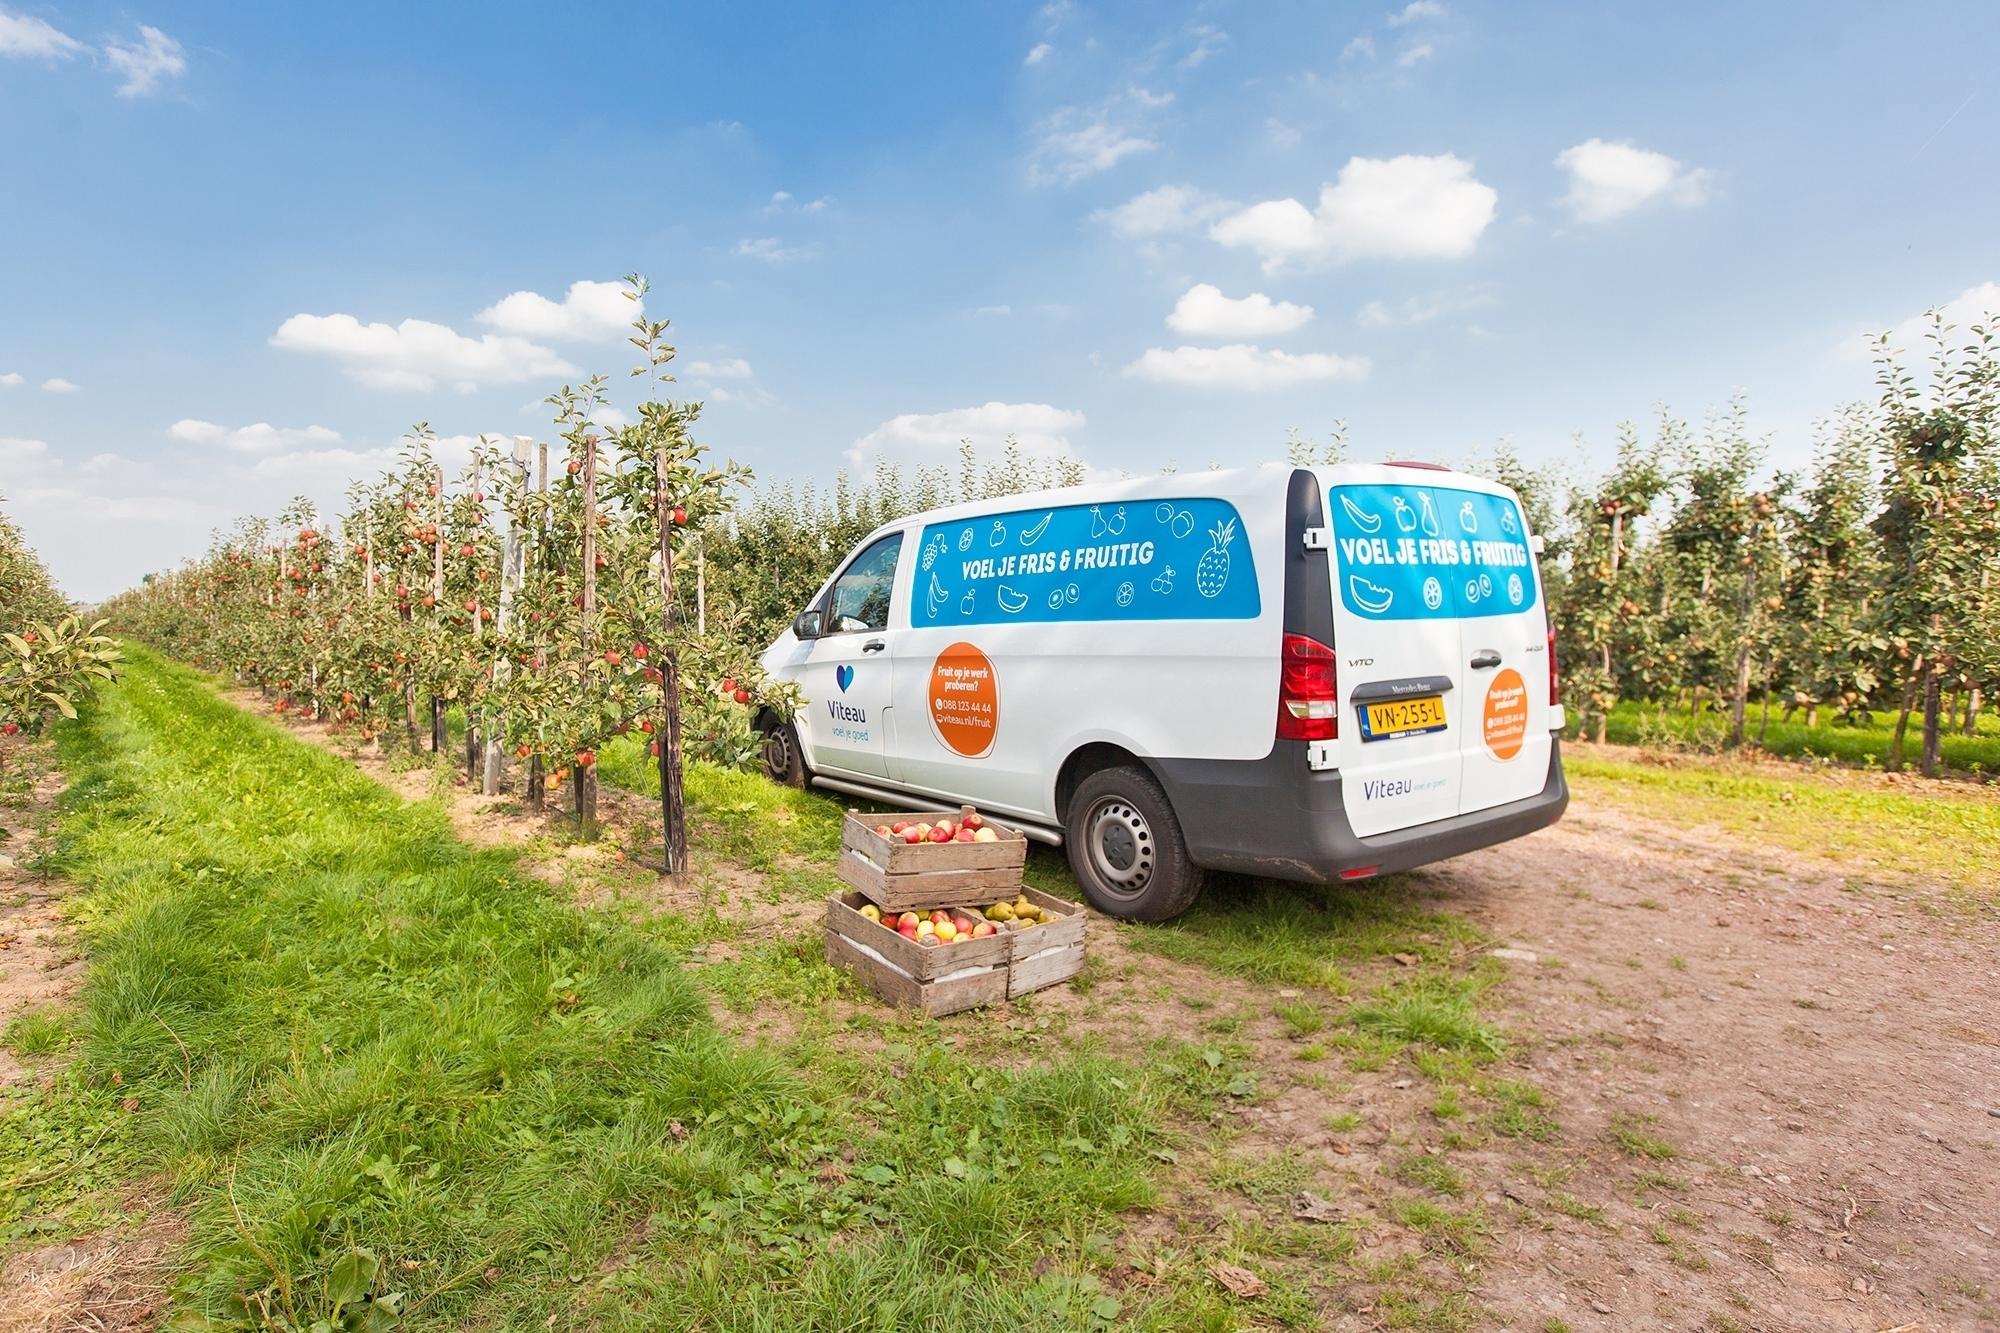 viteau-vers-fruit-bedrijven-boer-fruitboomgaard-kantoorfruit